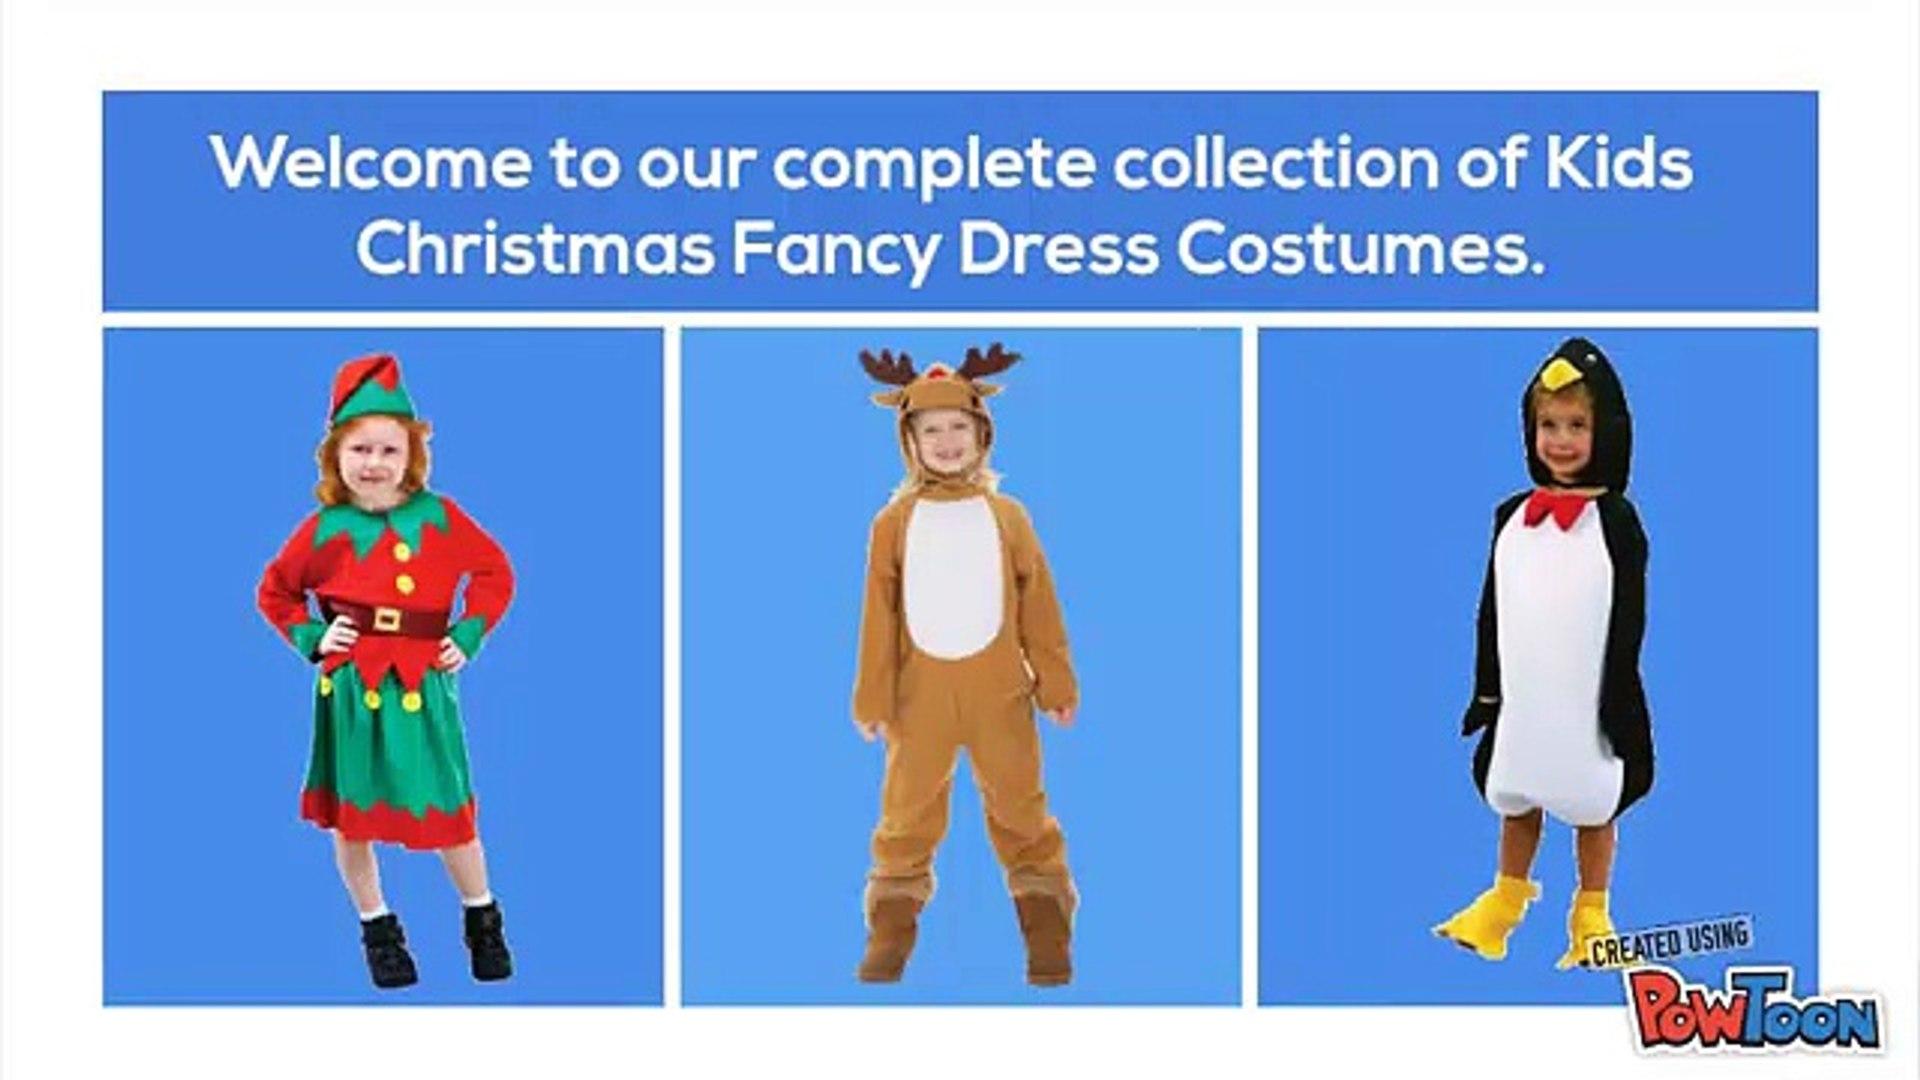 Christmas Fancy Dress Kids.Kids Christmas Fancy Dress Costumes